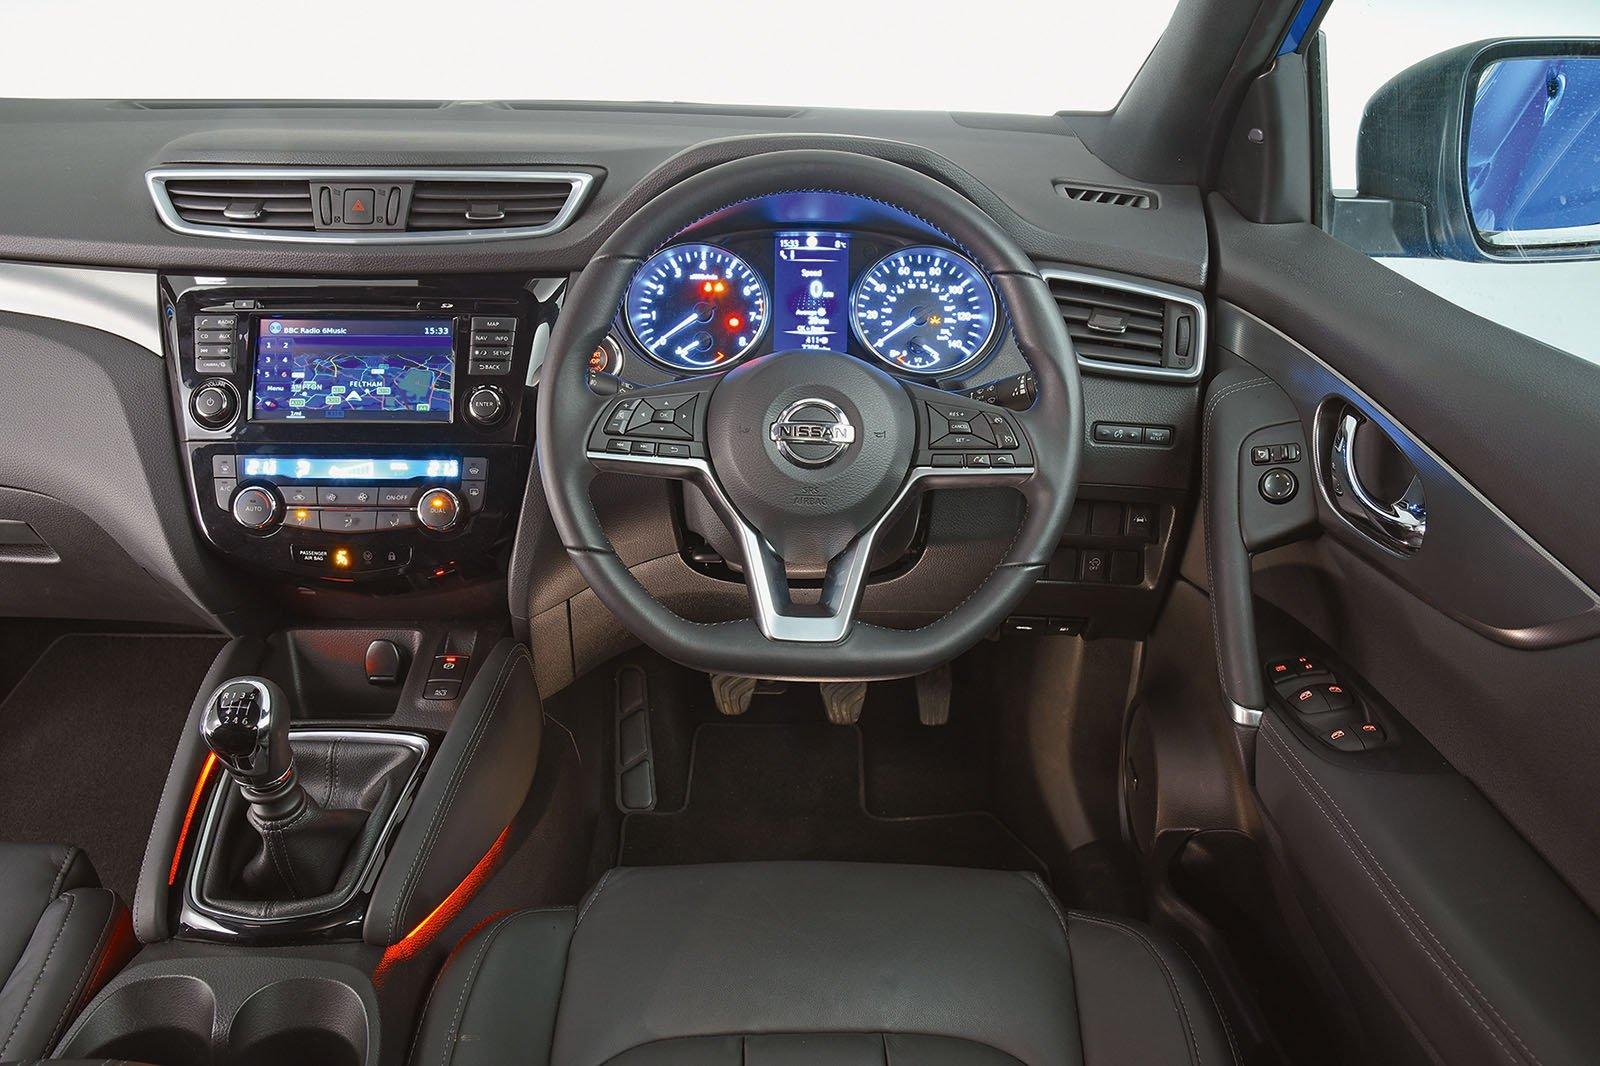 6: Nissan Qashqai 1.5 dCi 110 - interior